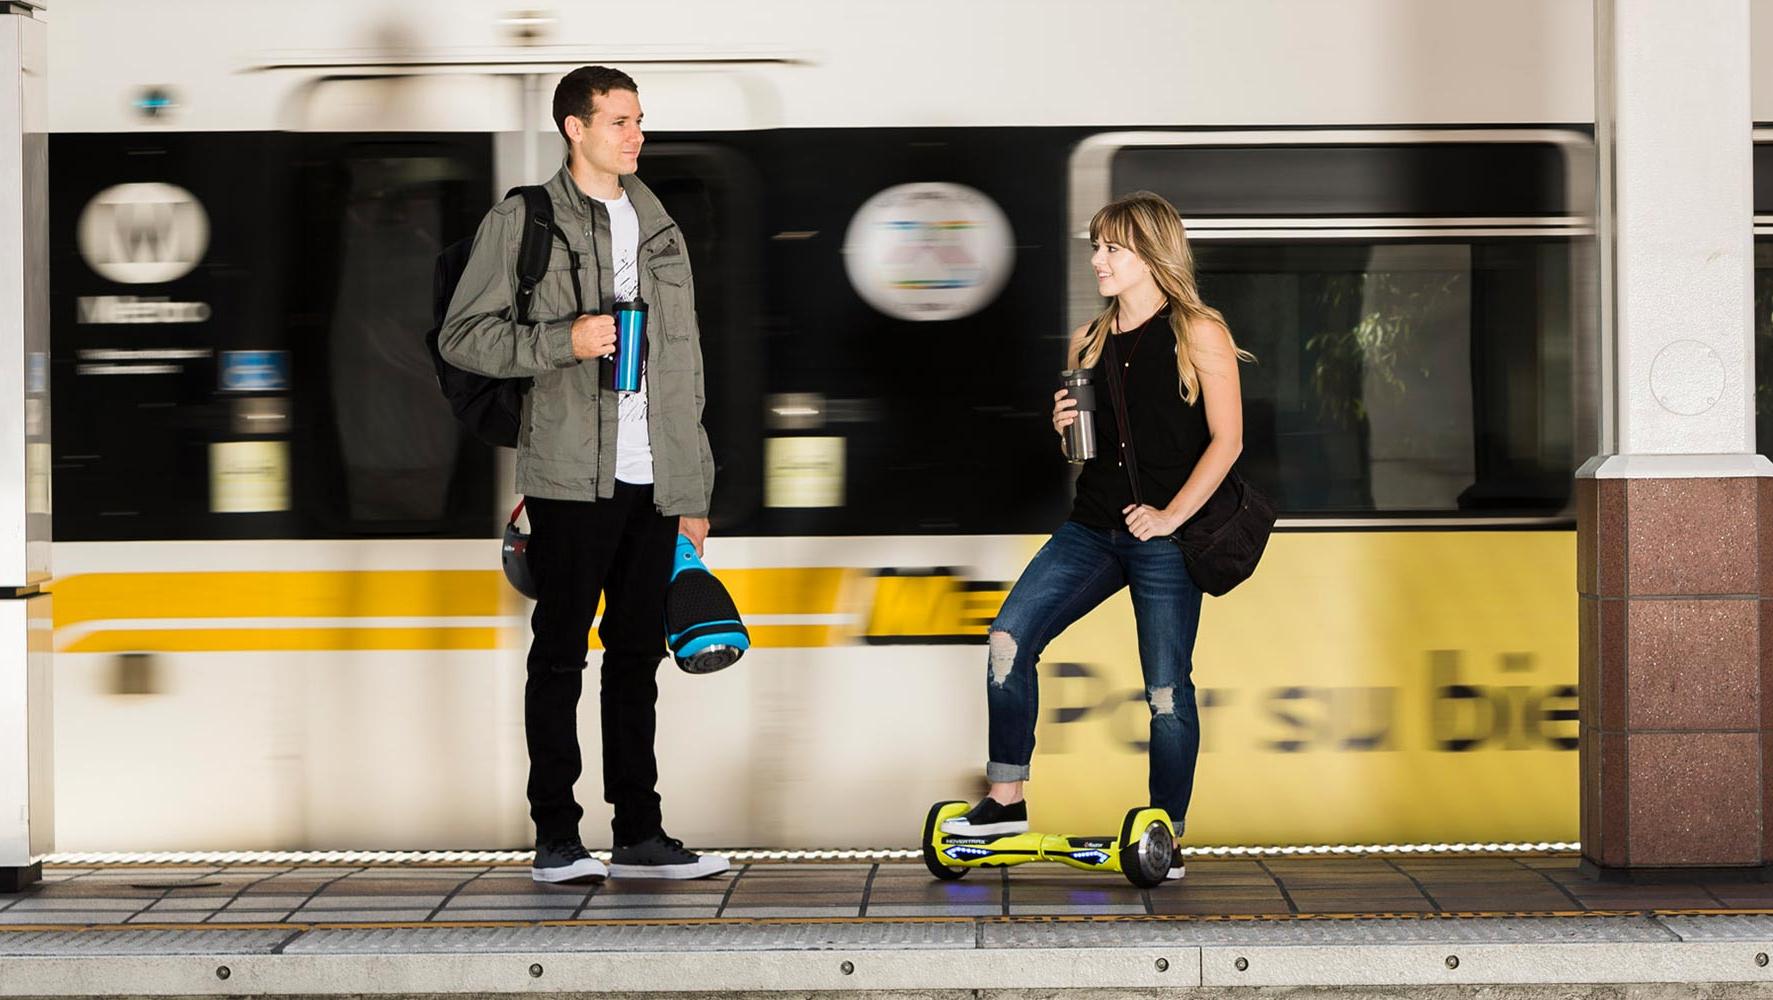 are hoverboards safe, hovertrax, best hoverboard, best self balancing scooter, self balancing scooter, self balancing electric scooter, balance scooter, electric balance scooter, hoverboard, hover board, hoverboard price, two wheel self balancing scooter